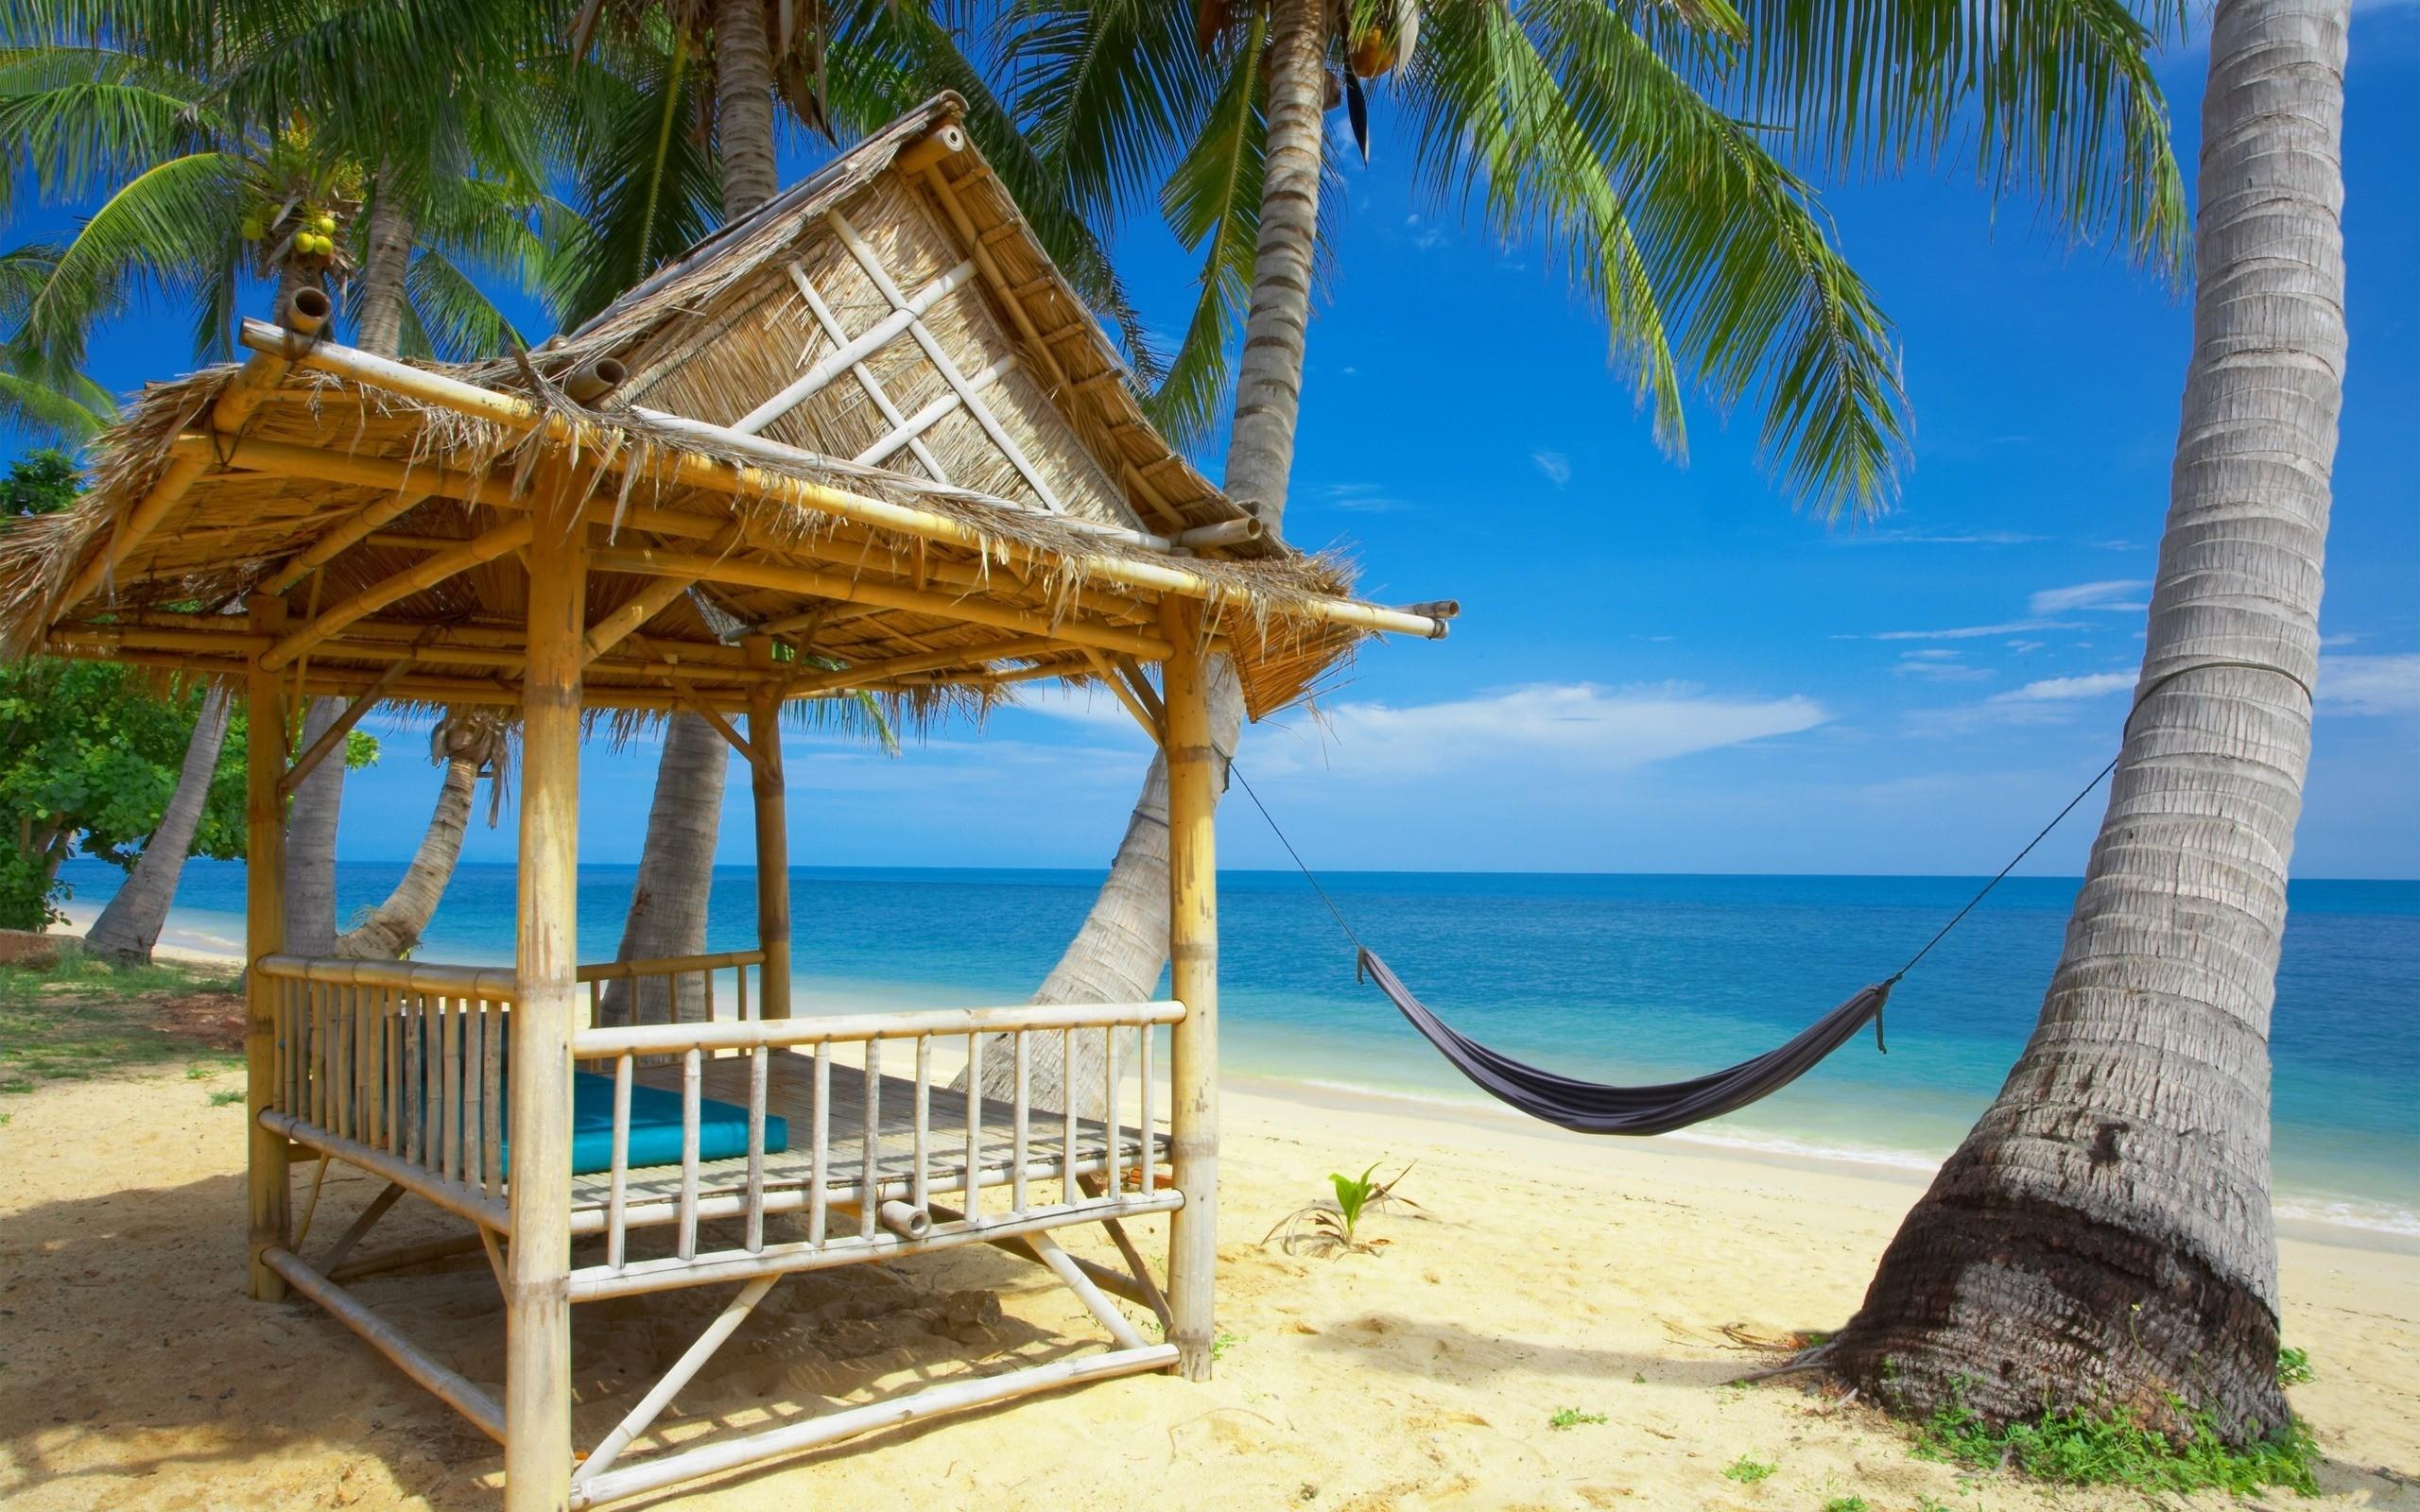 Summer Backgrounds Full HD Desktop Download High Definiton 2560x1600